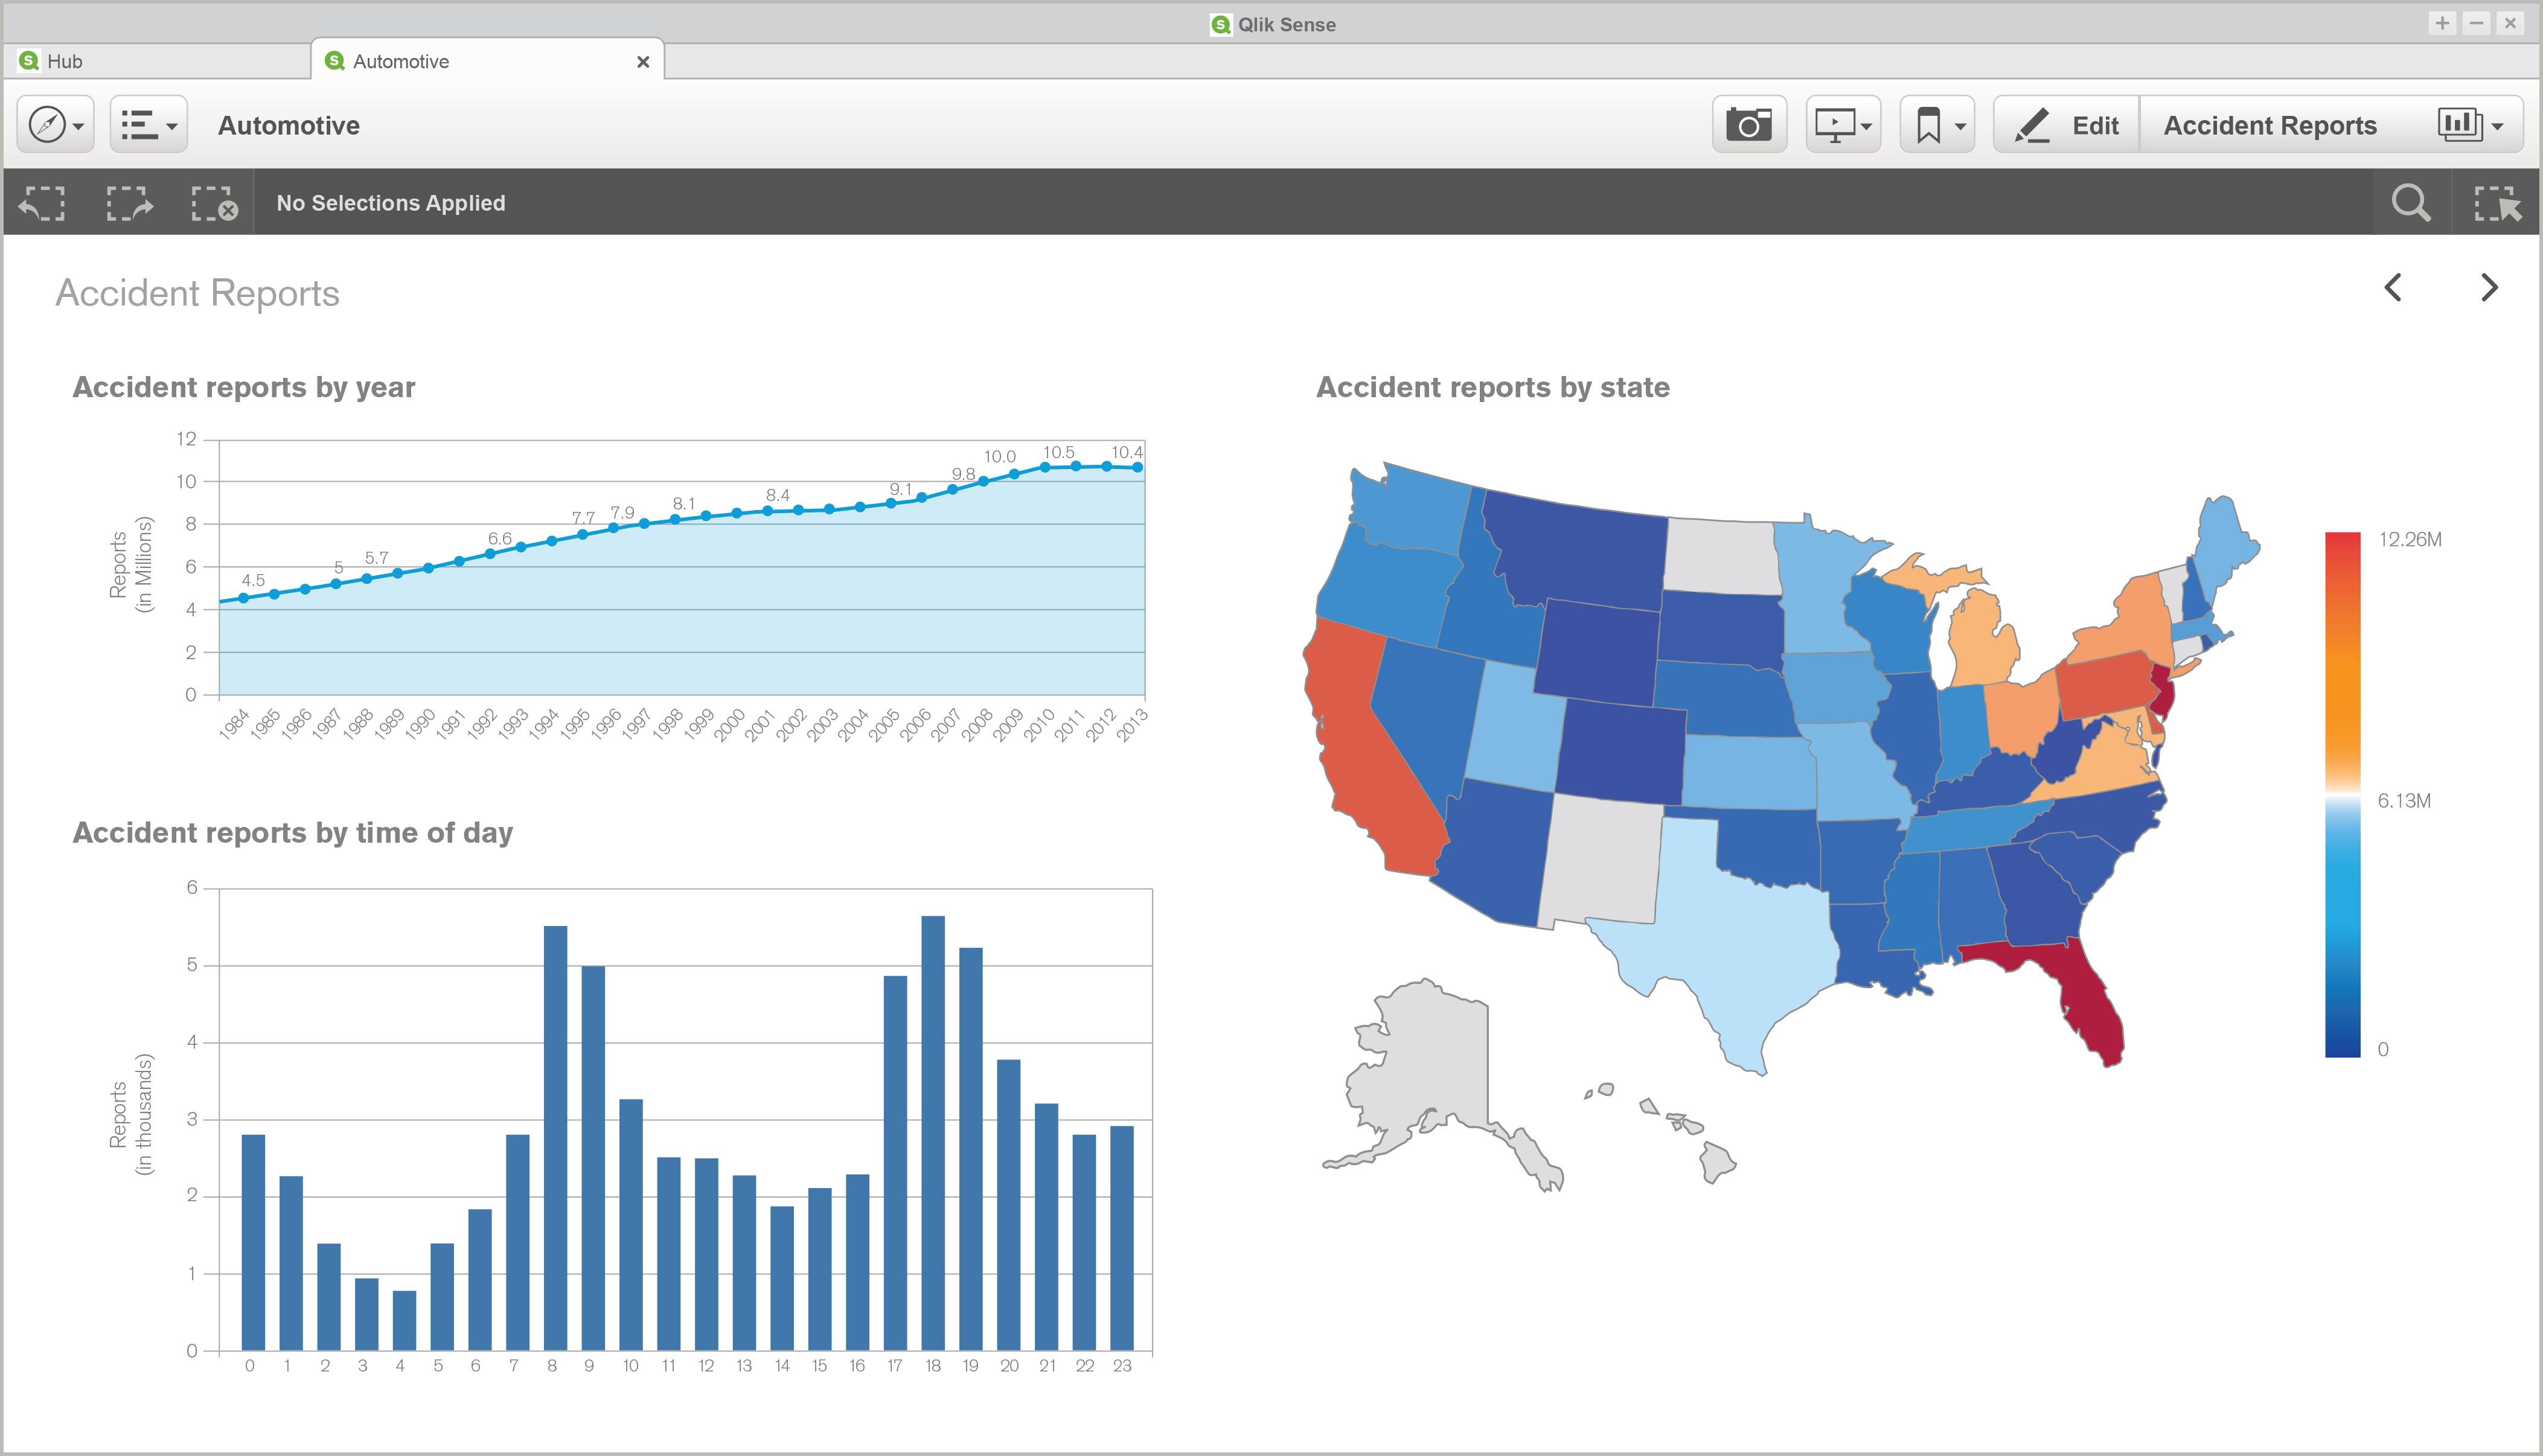 Qlik Sense - Qlik Sense mapping and graphing capabilities